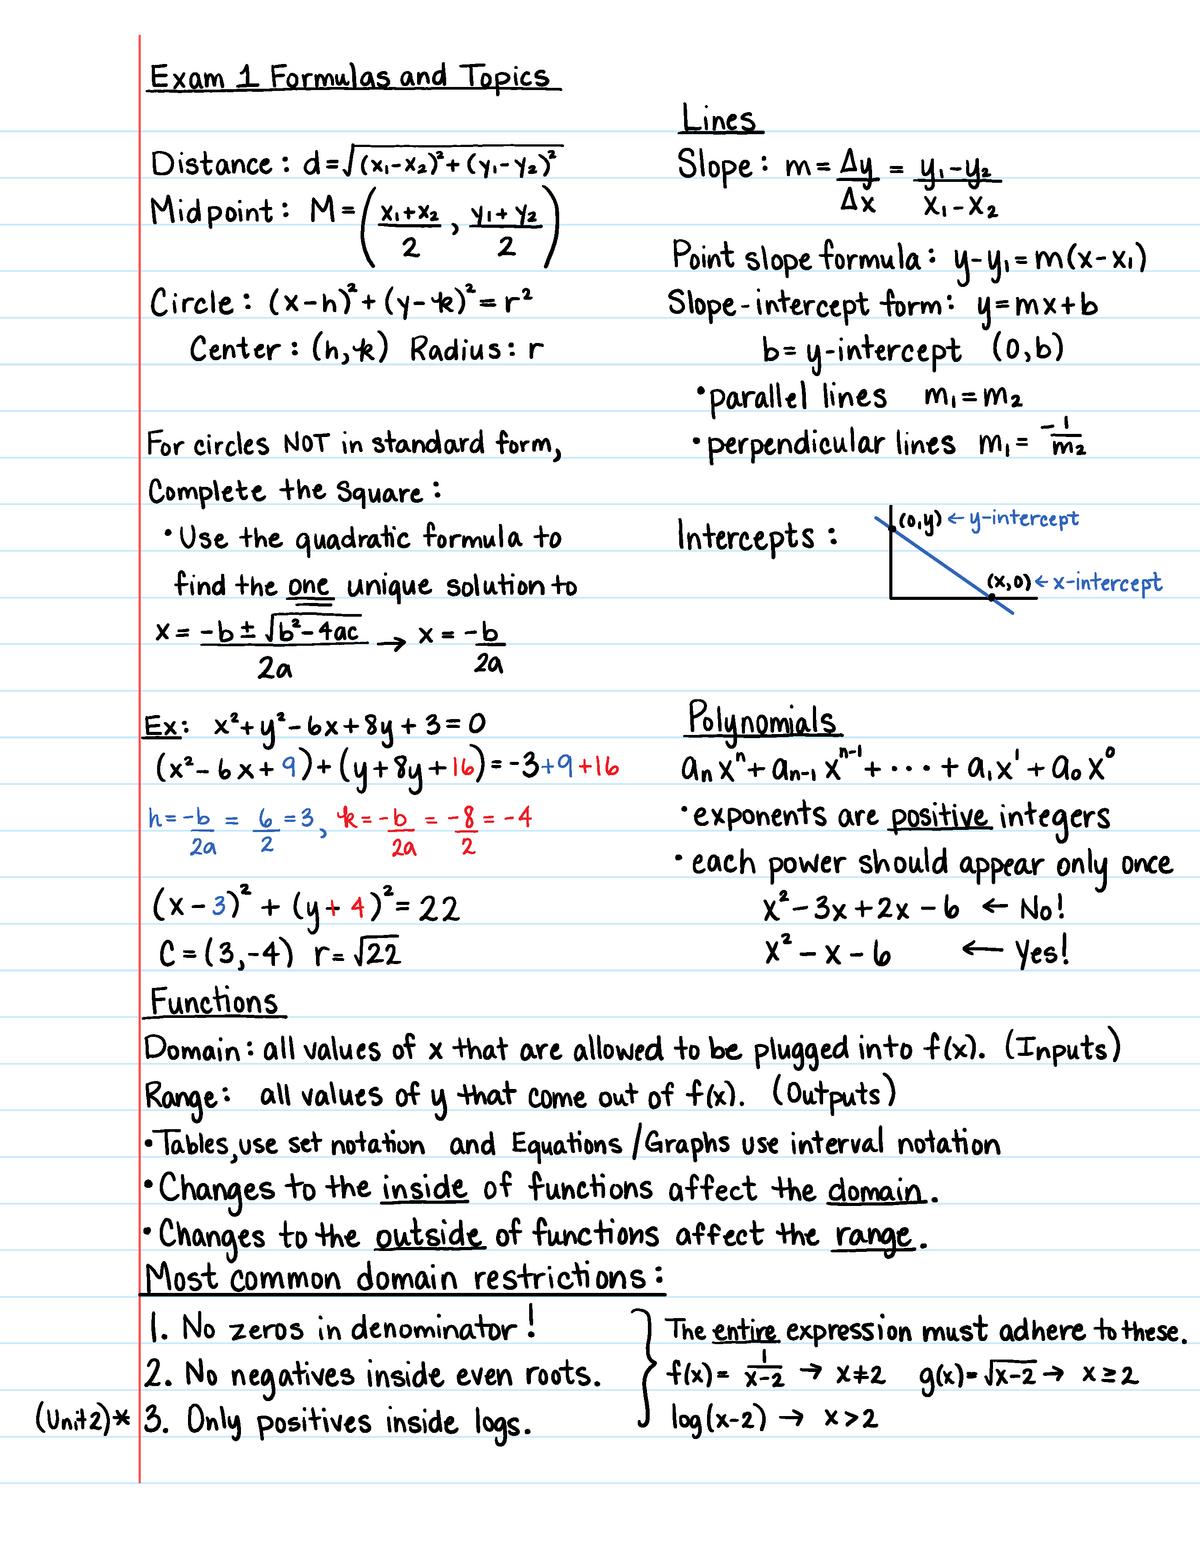 Math 1113 Unit 1 Study Guide - MATH 1113E: Precalculus - StuDocu